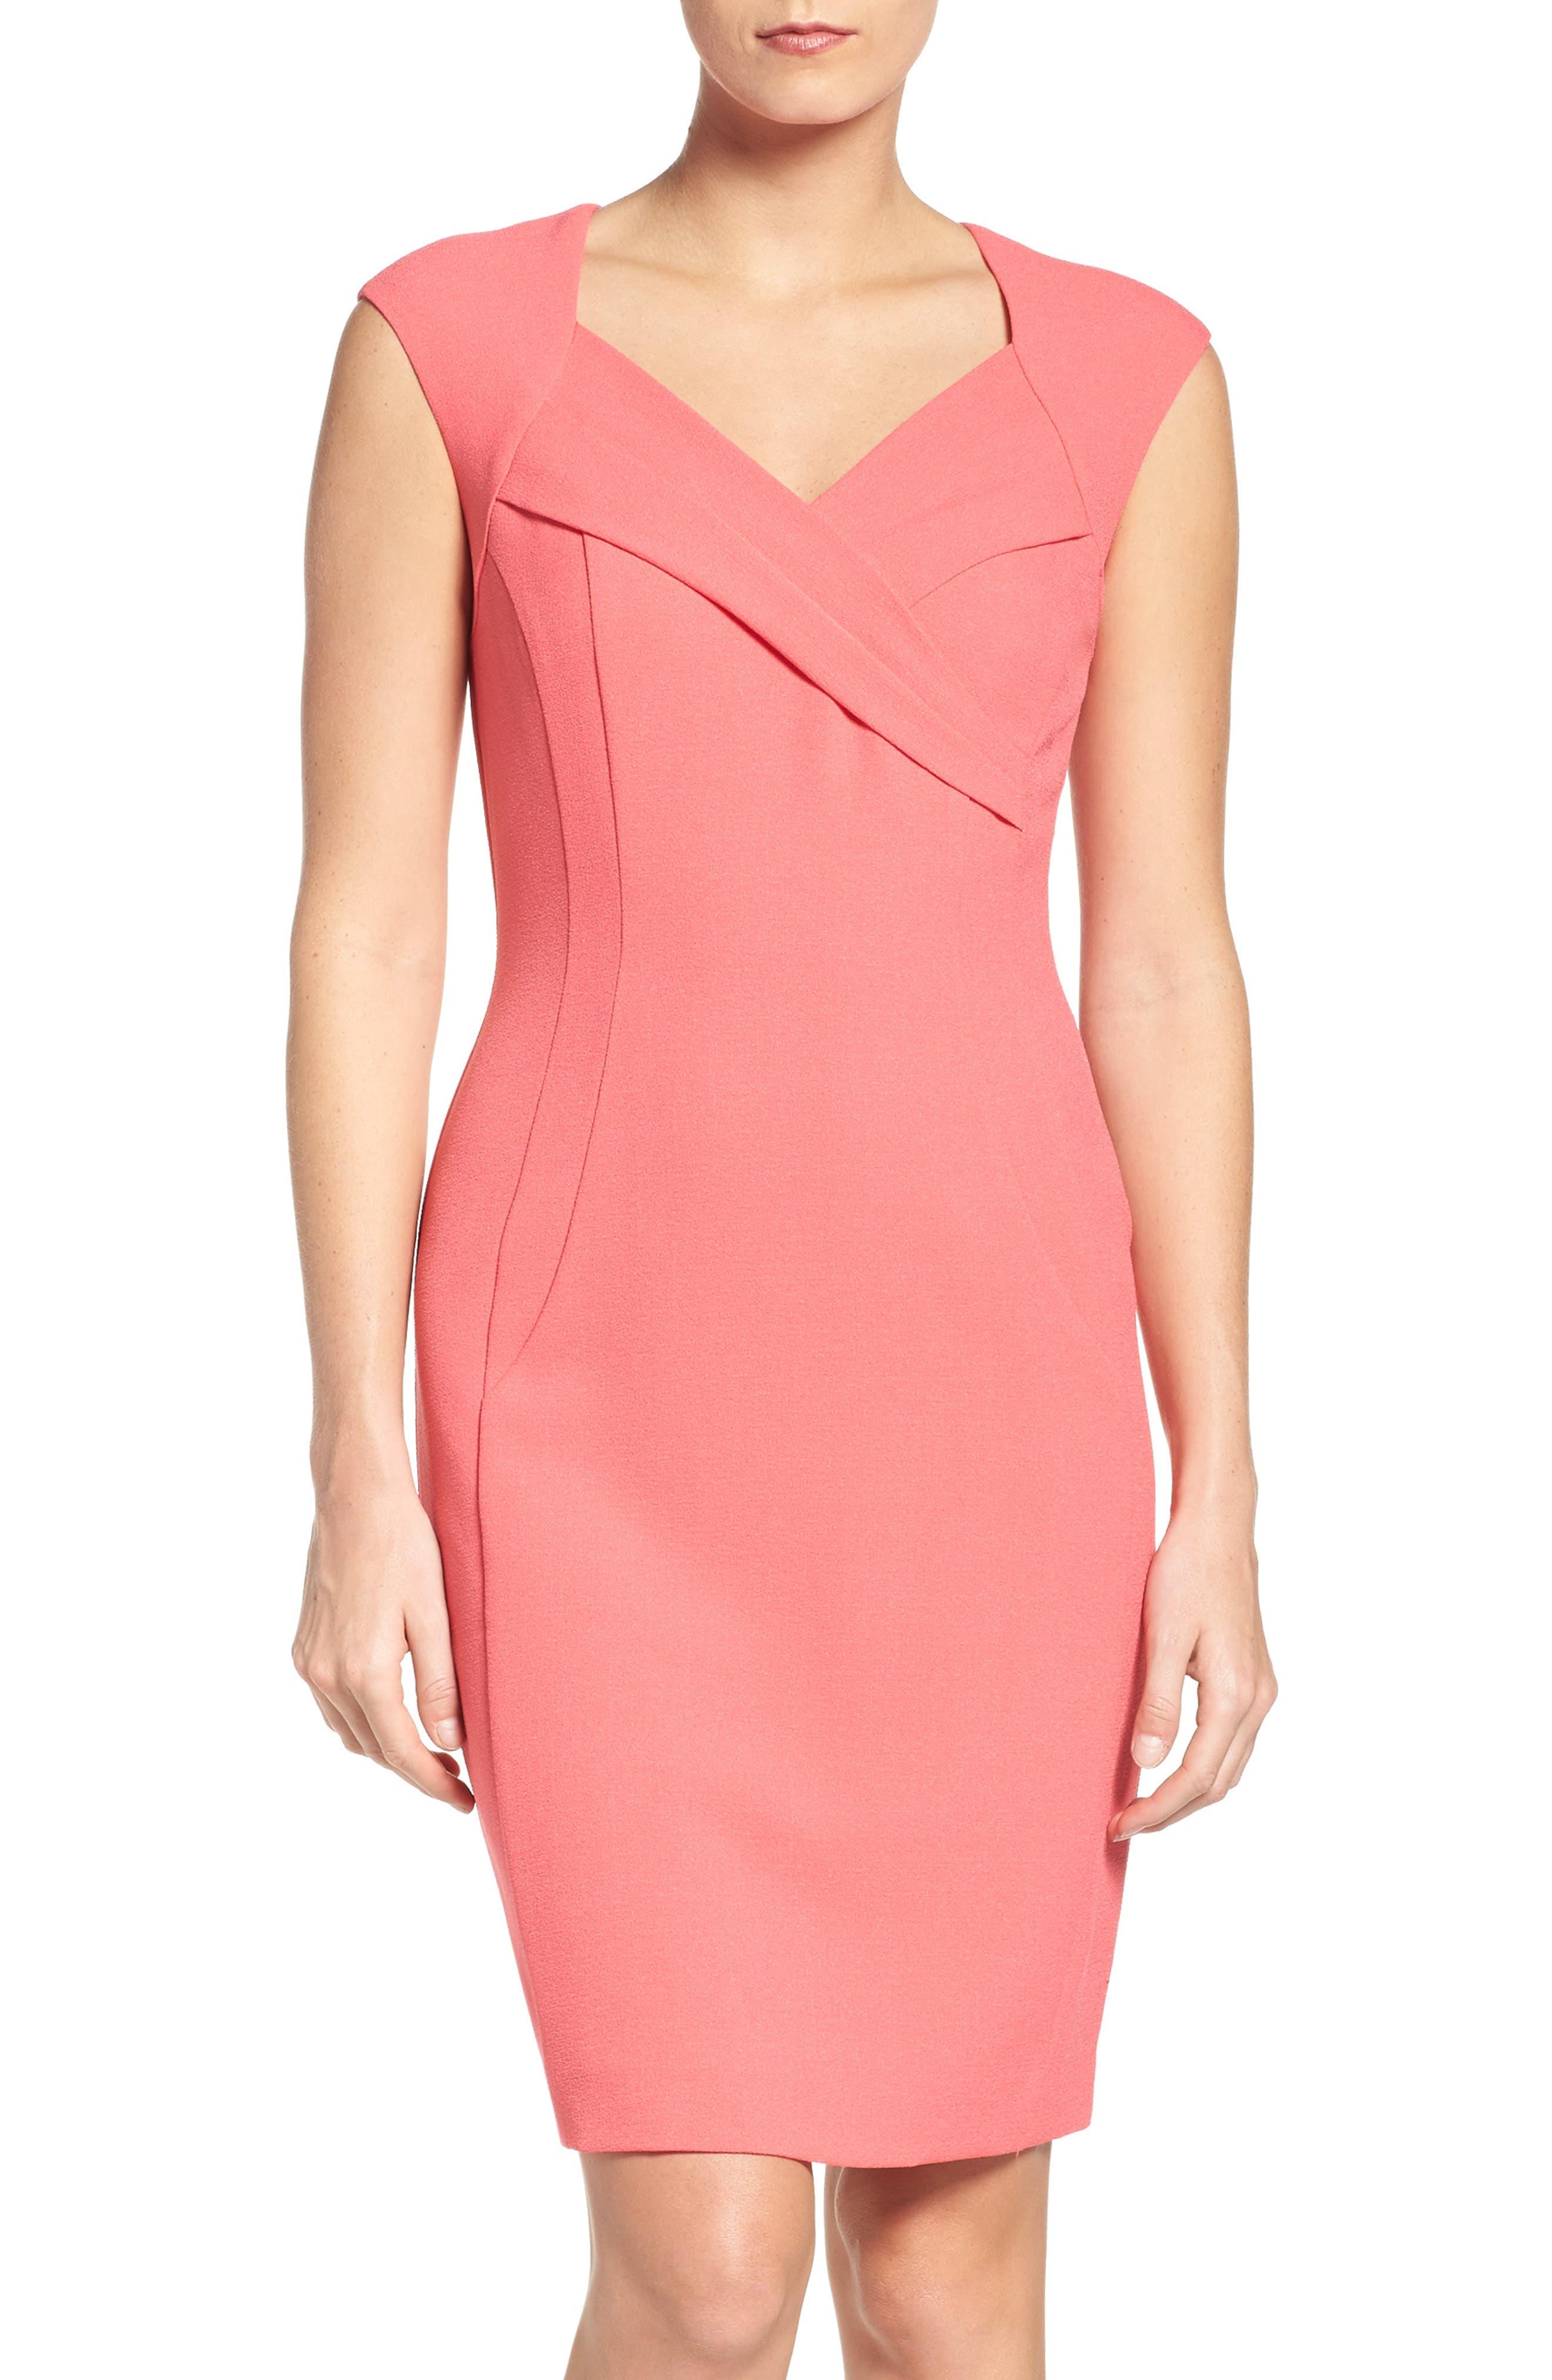 Alternate Image 1 Selected - Ellen Tracy Crepe Sheath Dress